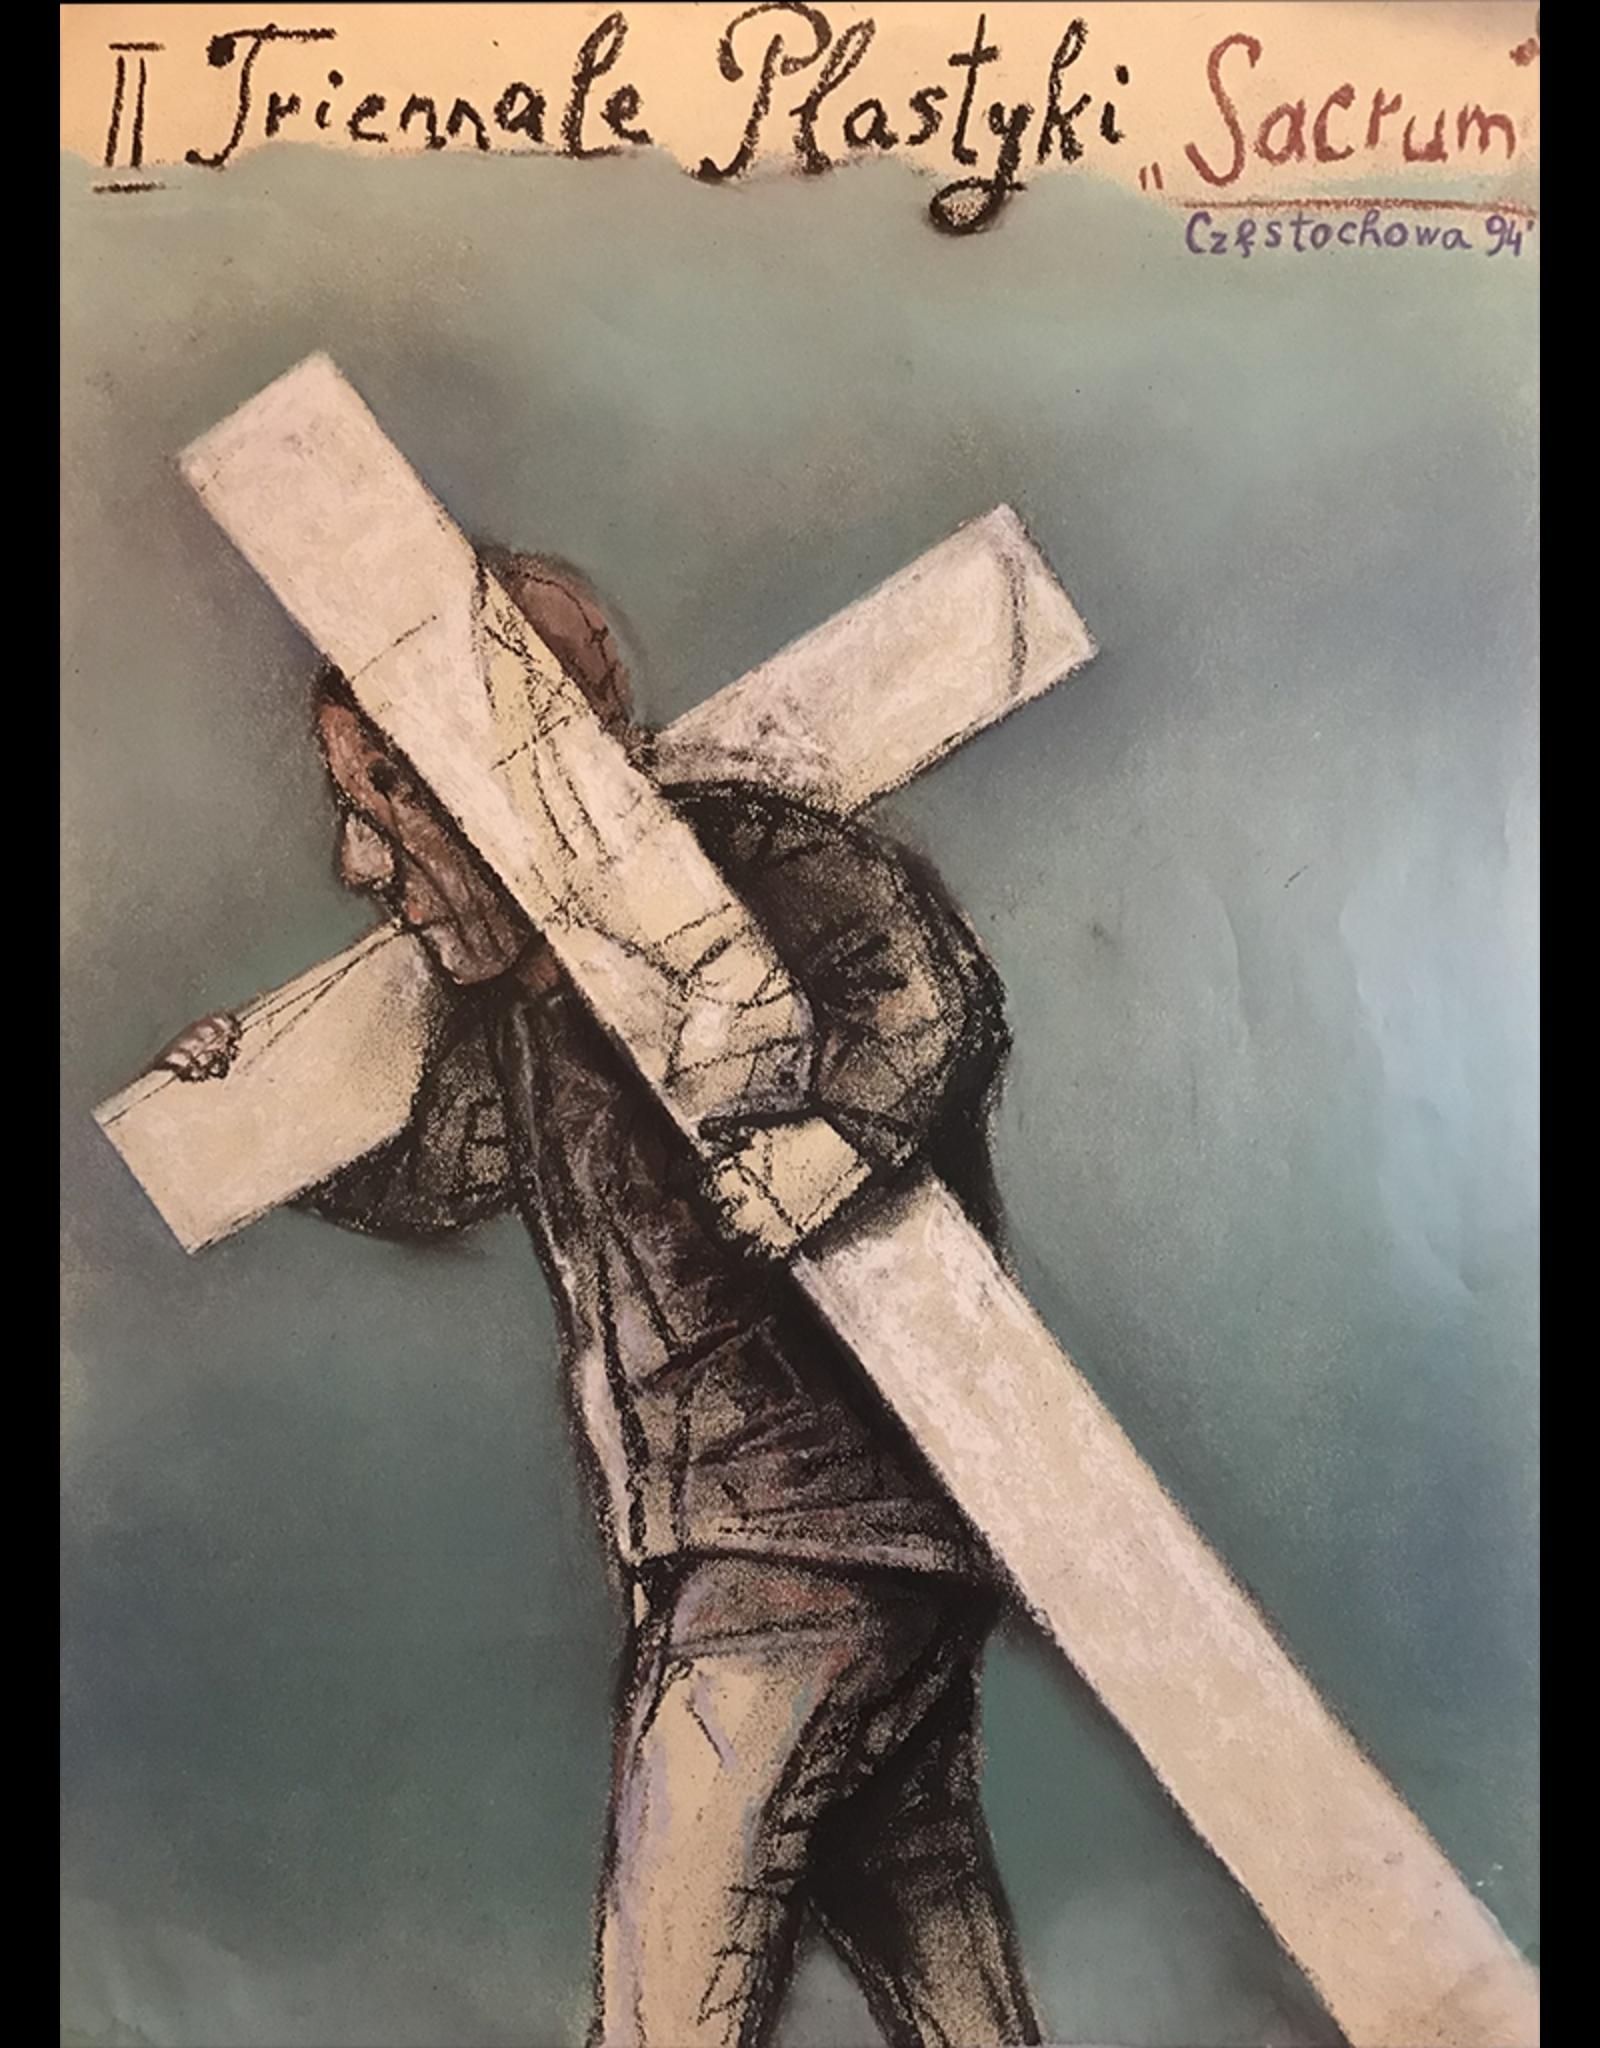 SPV Triennale Plastyki Sacrum Poster